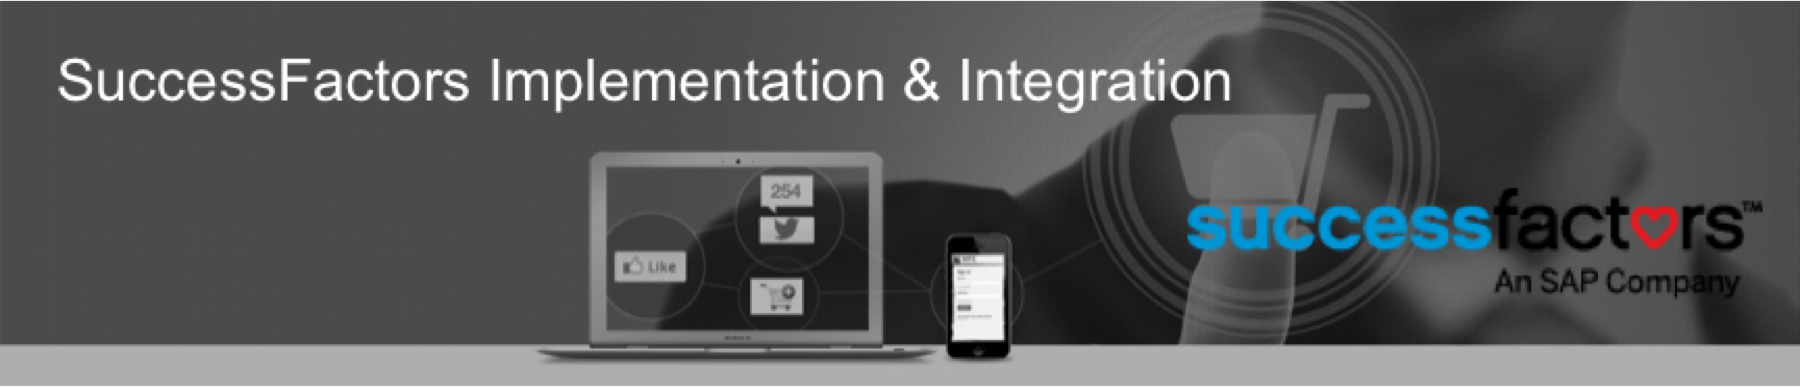 SuccessFactor System Integrator